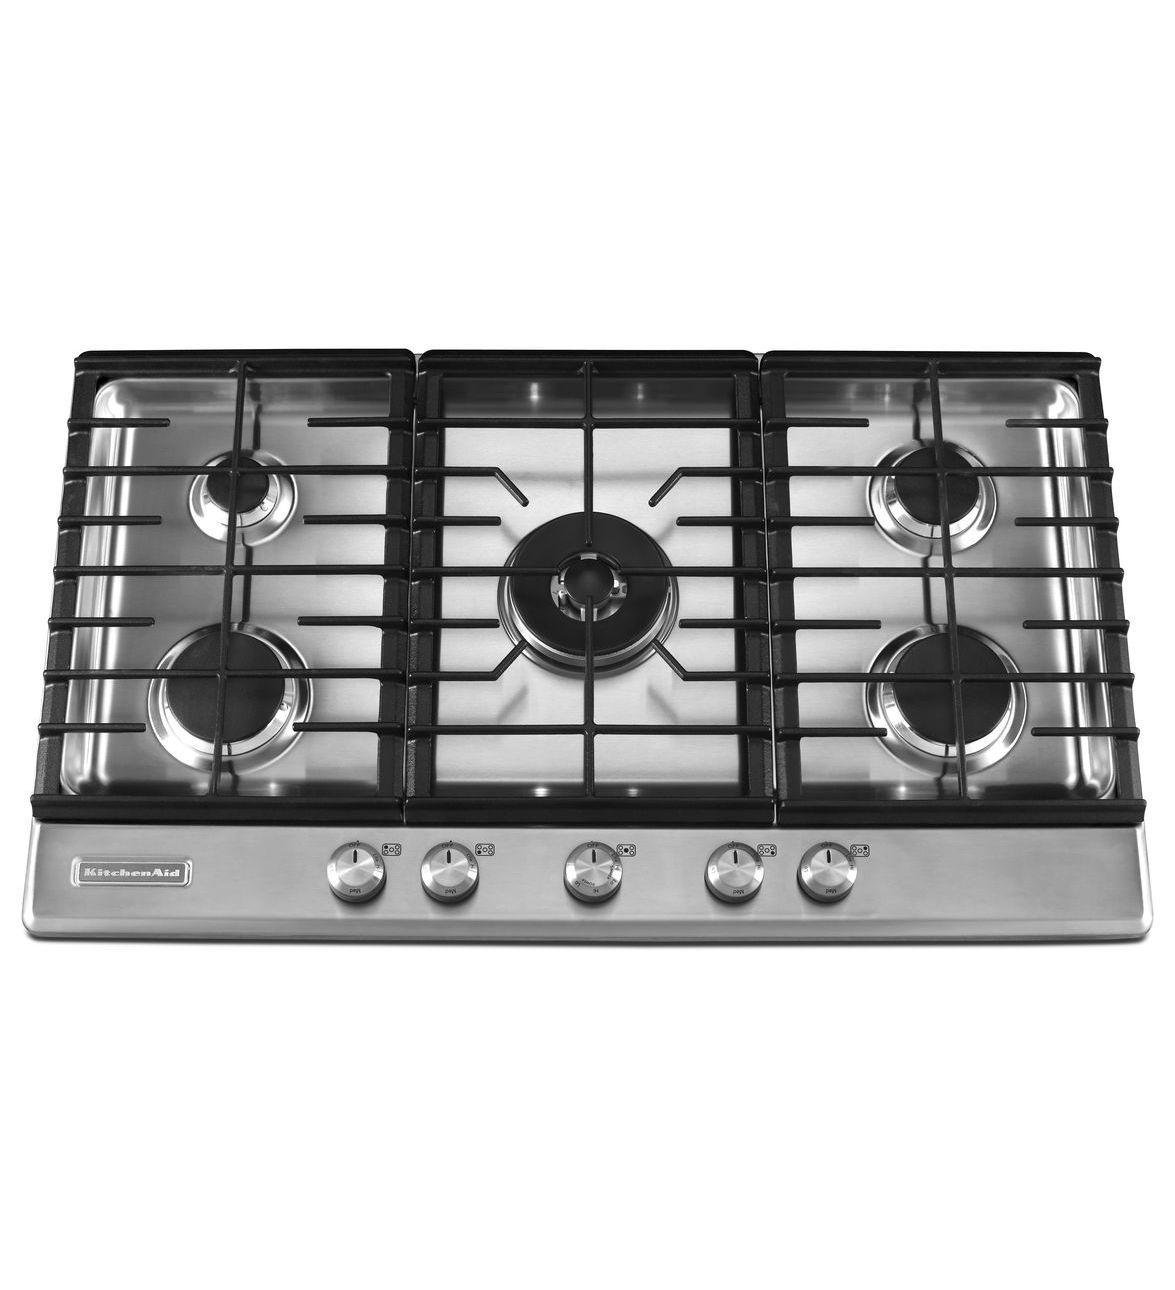 Kitchenaid 36 Inch 5 Burner Gas Cooktop Architect Series Ii Kfgs366vss Stainless Steel